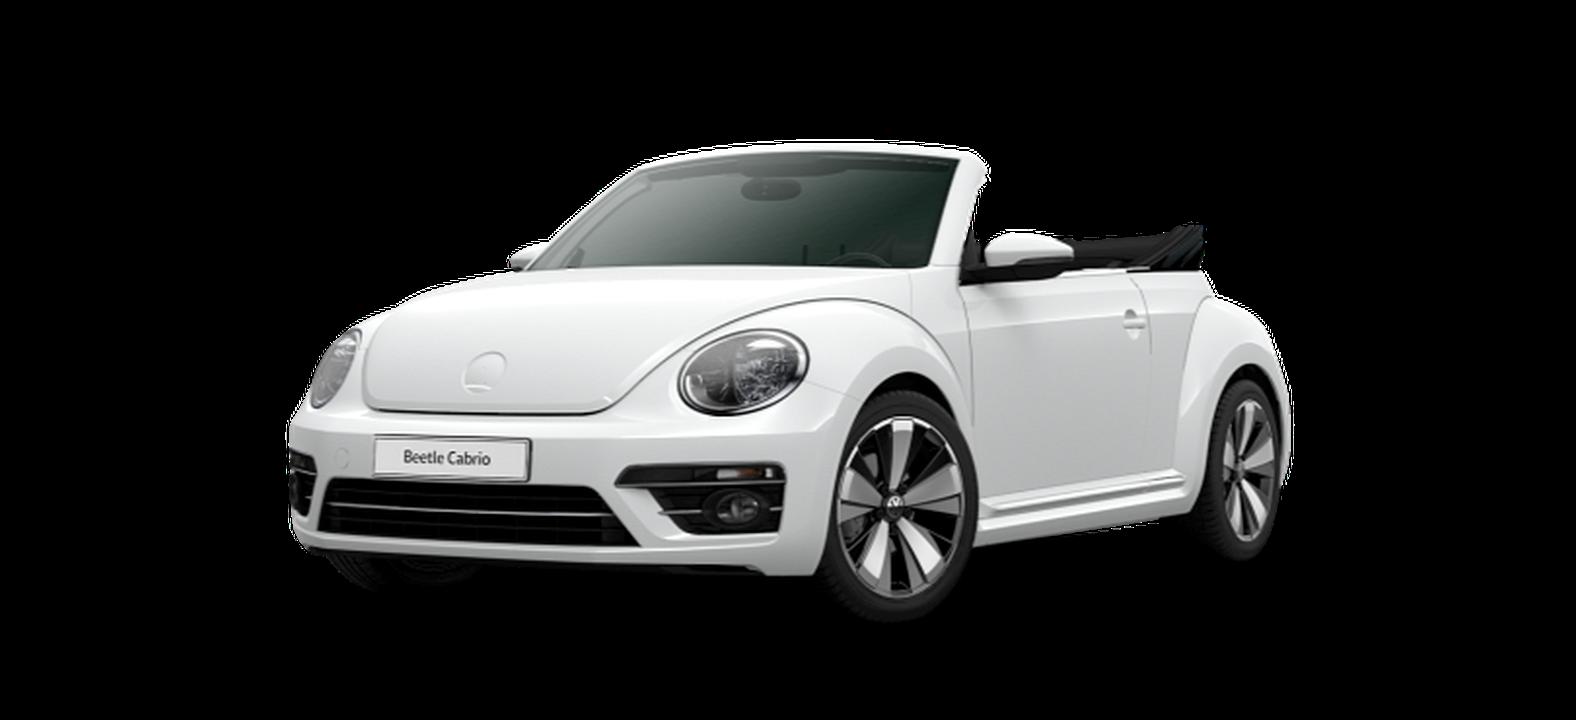 vw-beetle-cabriolet-frontansicht